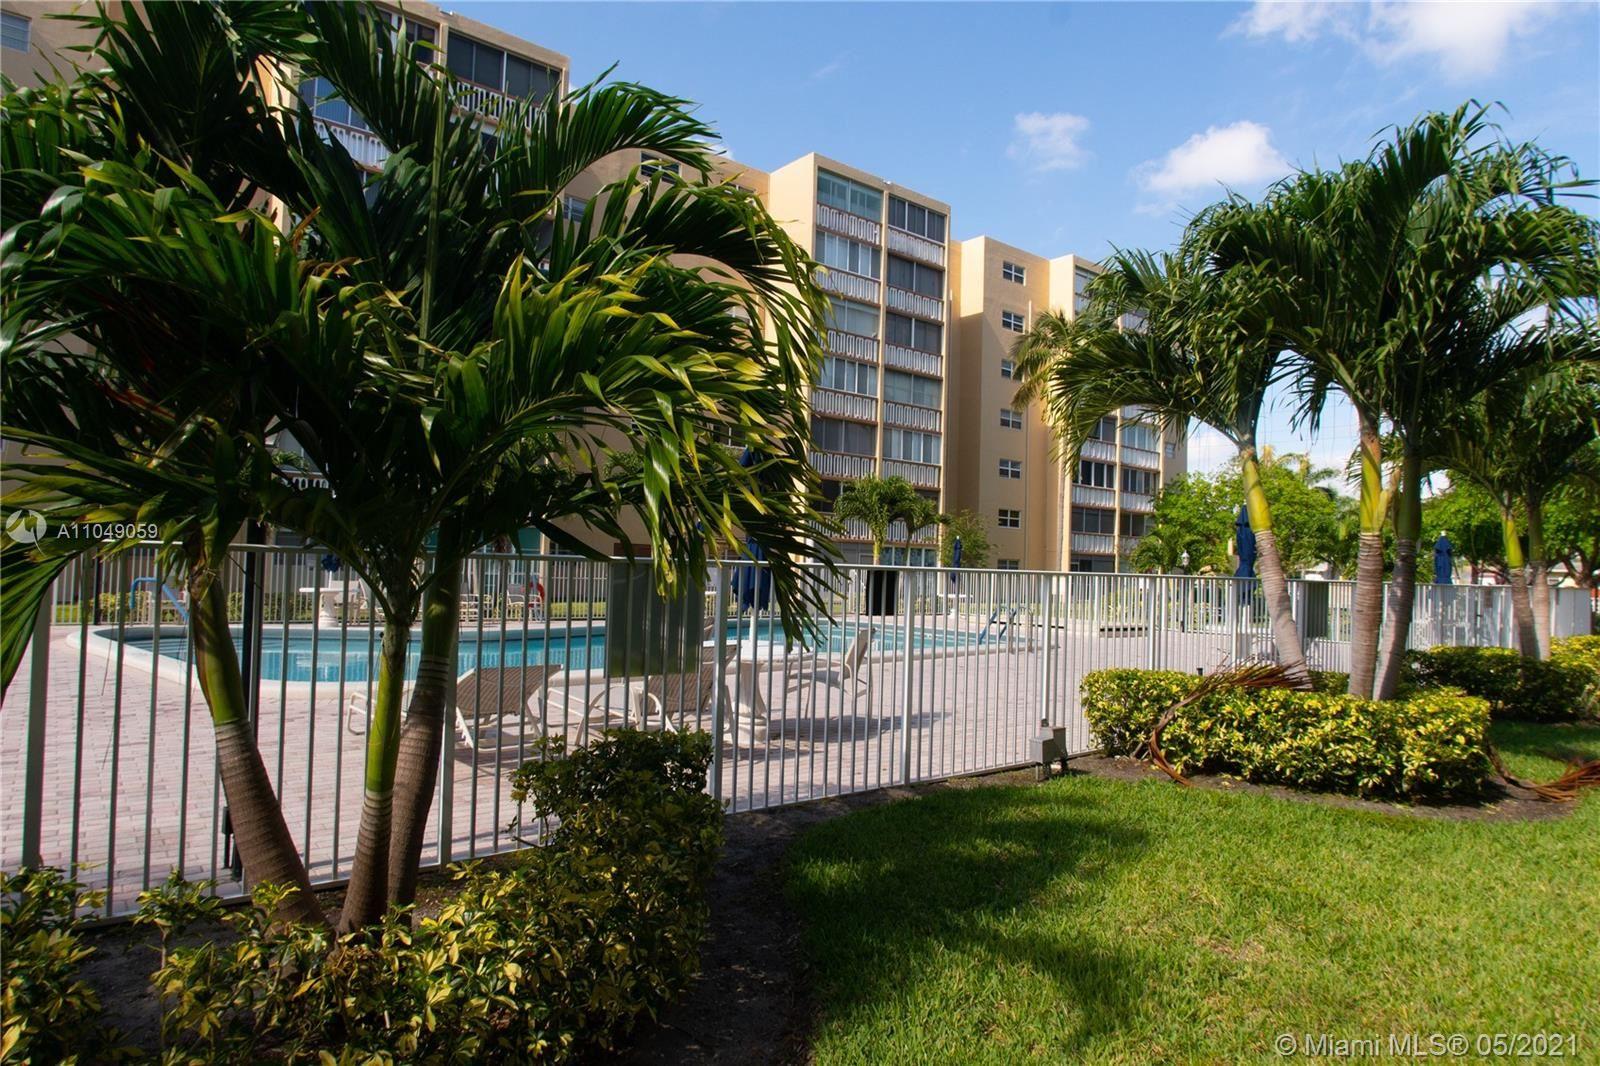 619 NE 14th Ave #107, Hallandale Beach, FL 33009 - #: A11049059